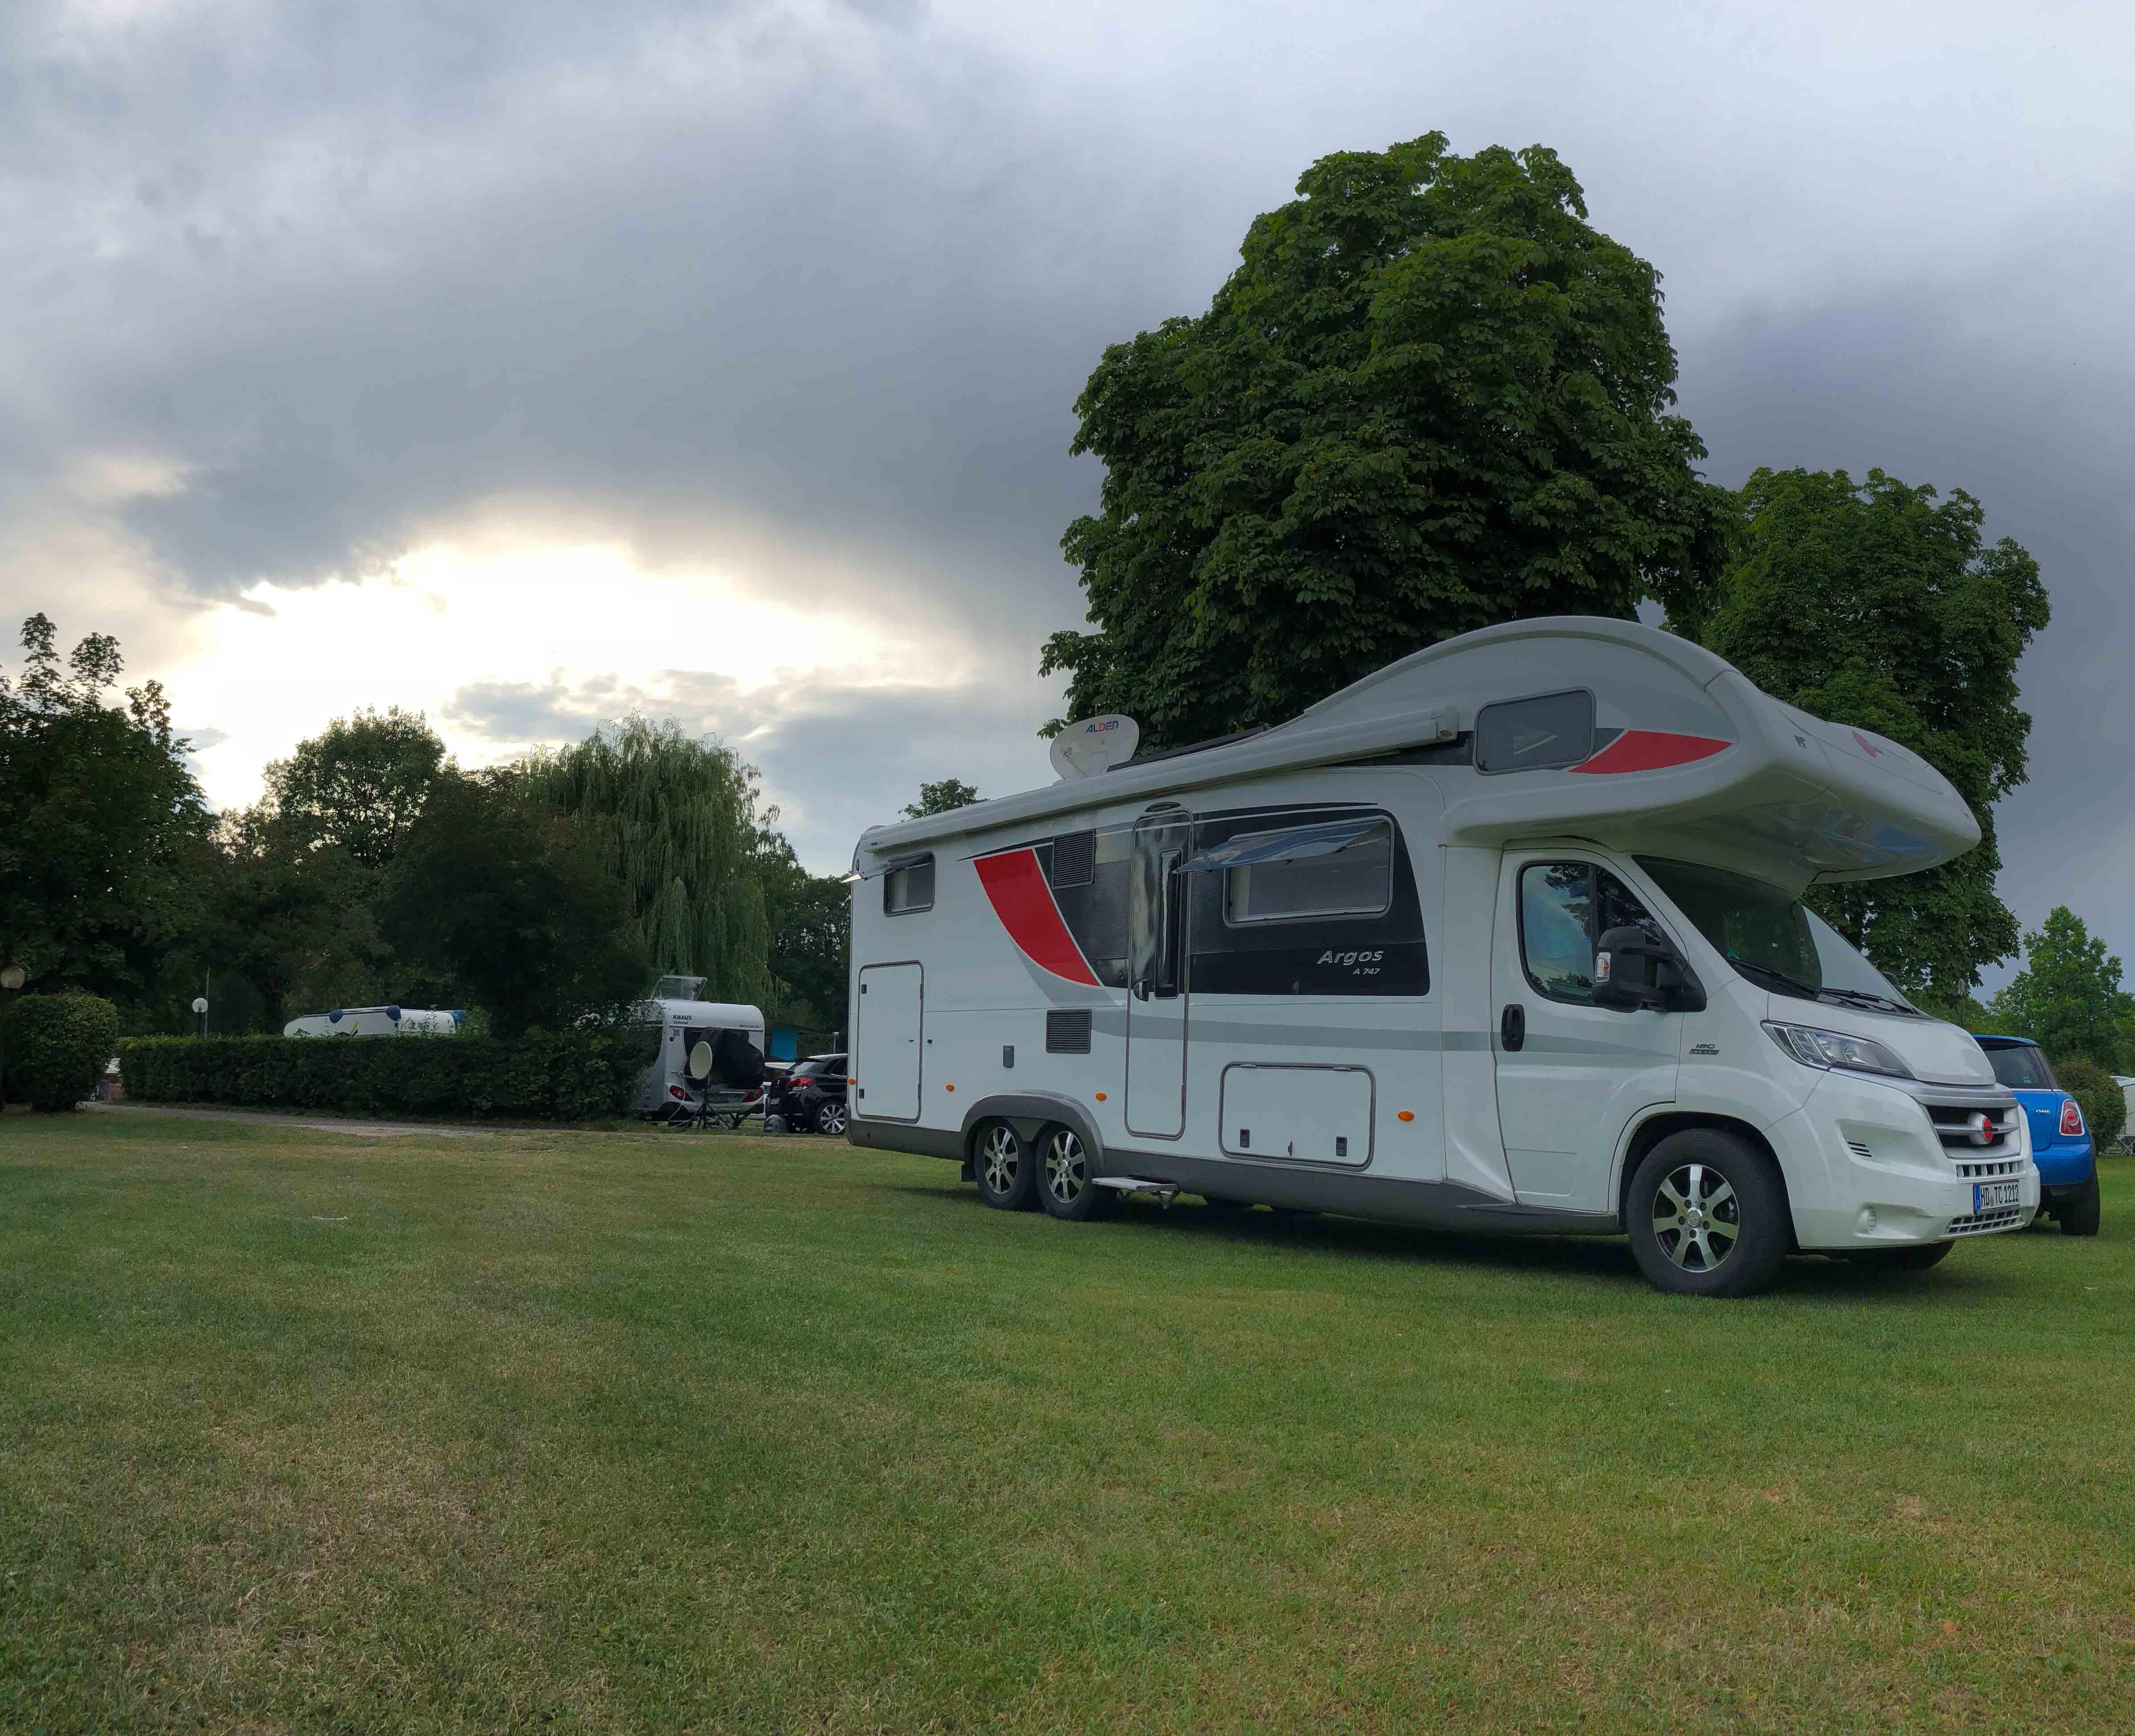 Campingplatz Kehl03